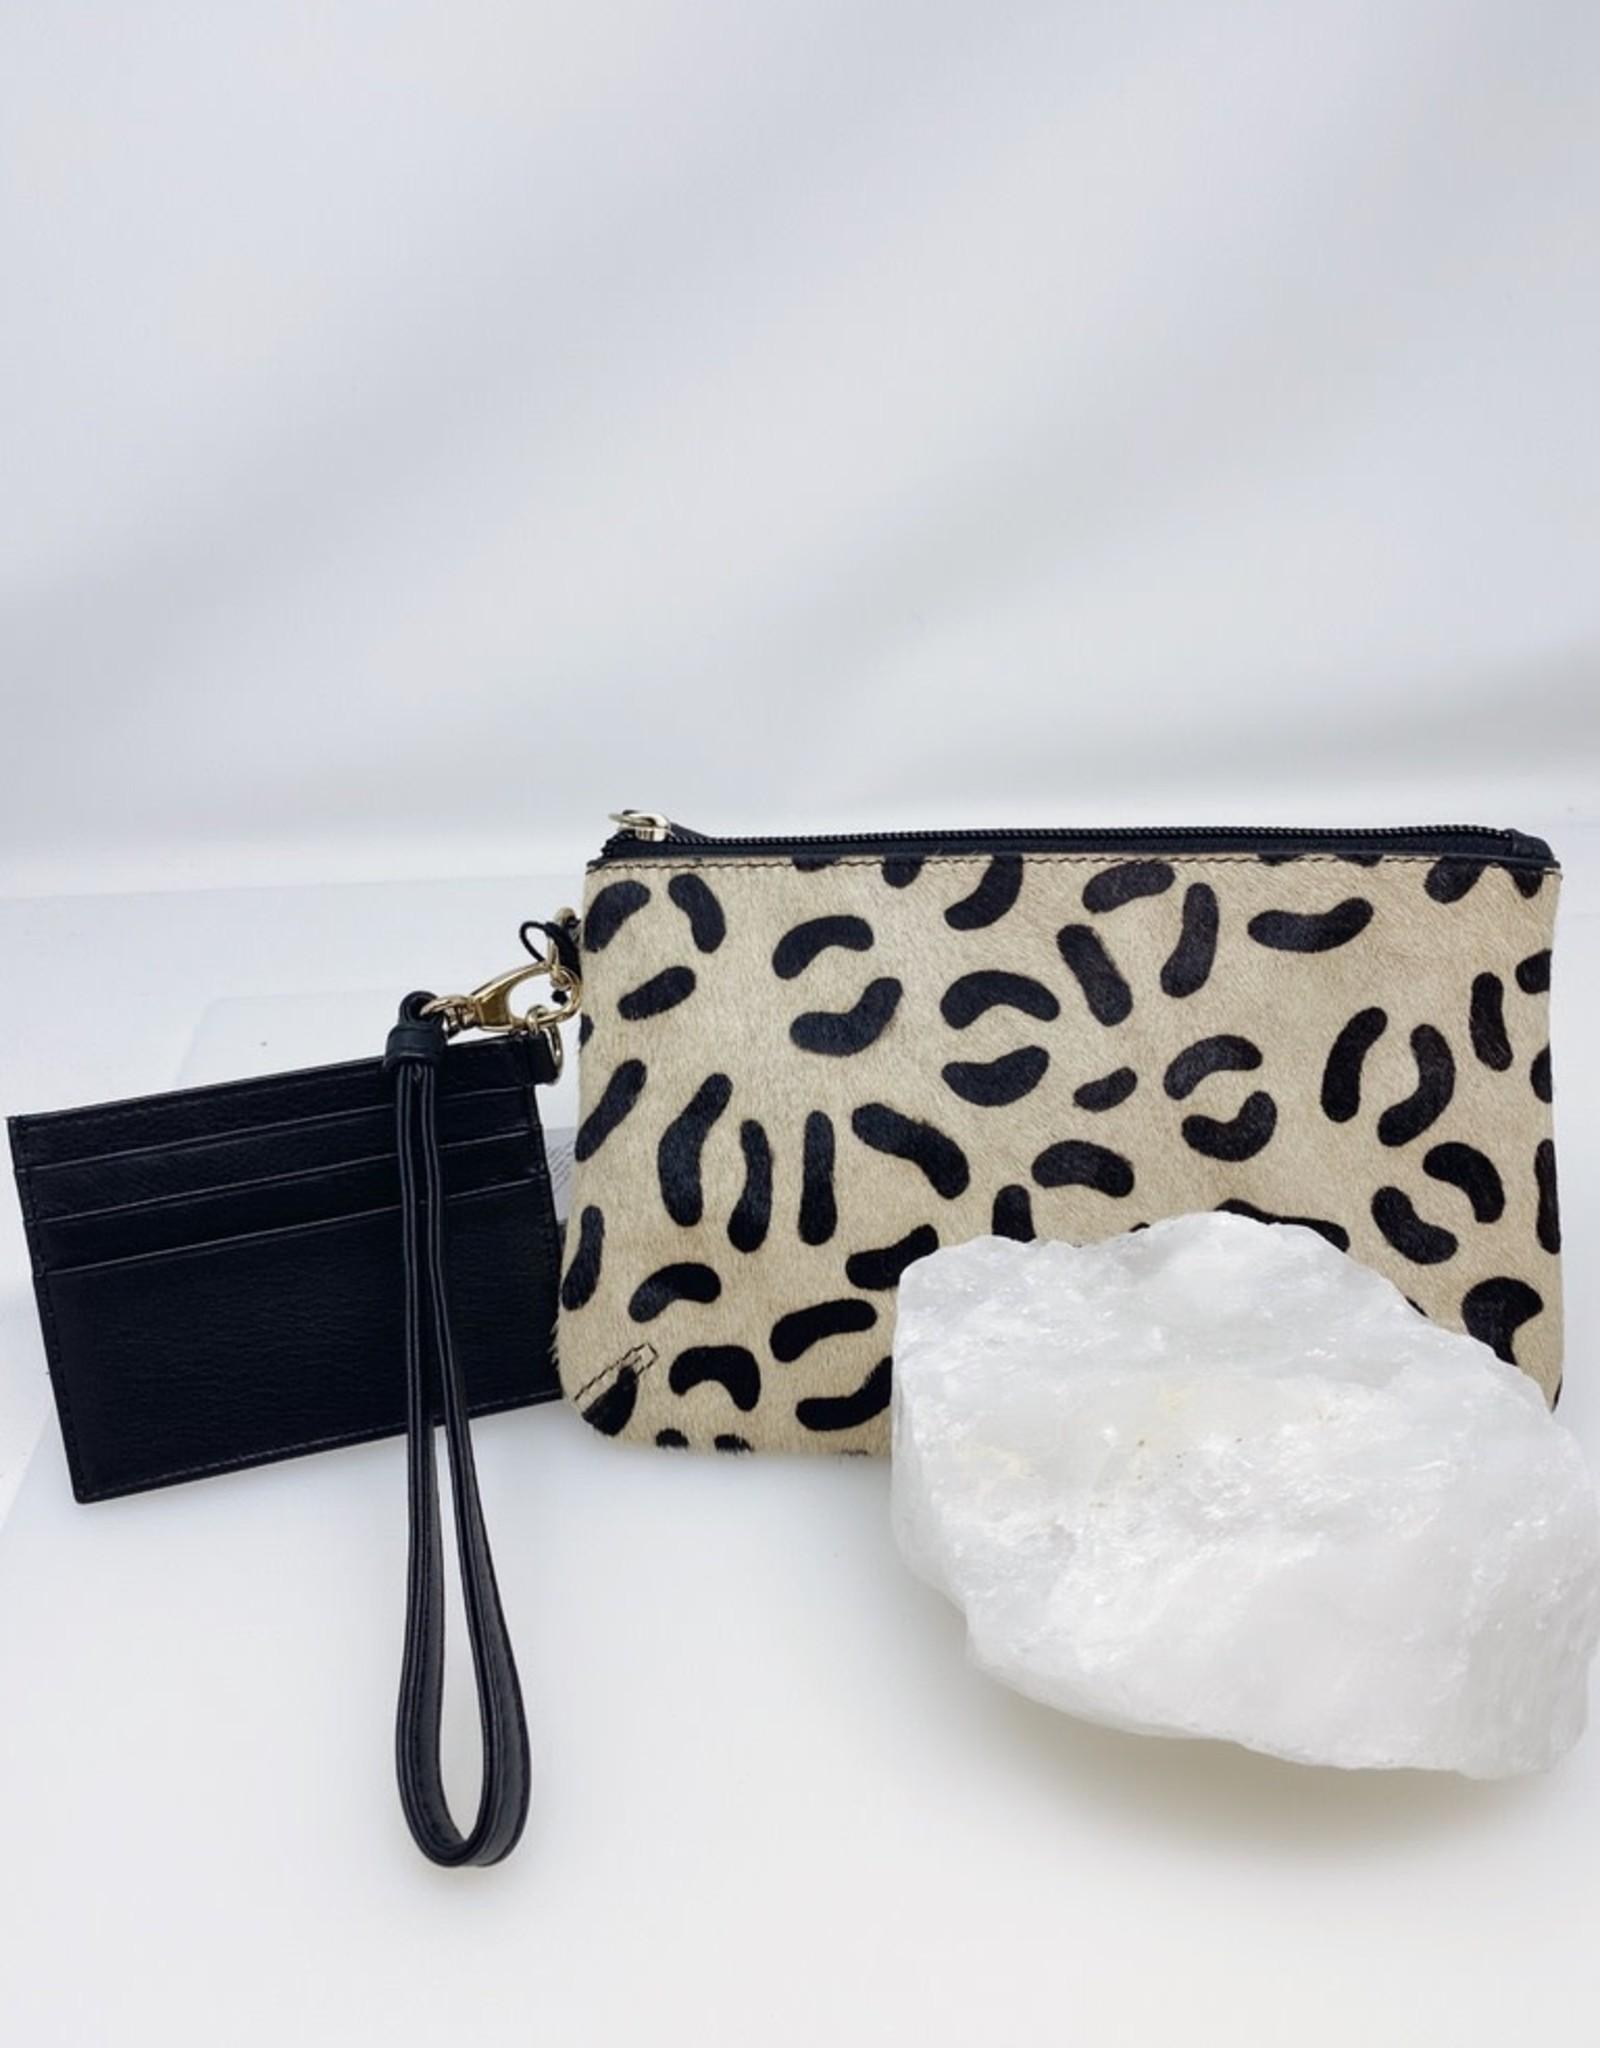 Wristlet Set- Cheetah with Black